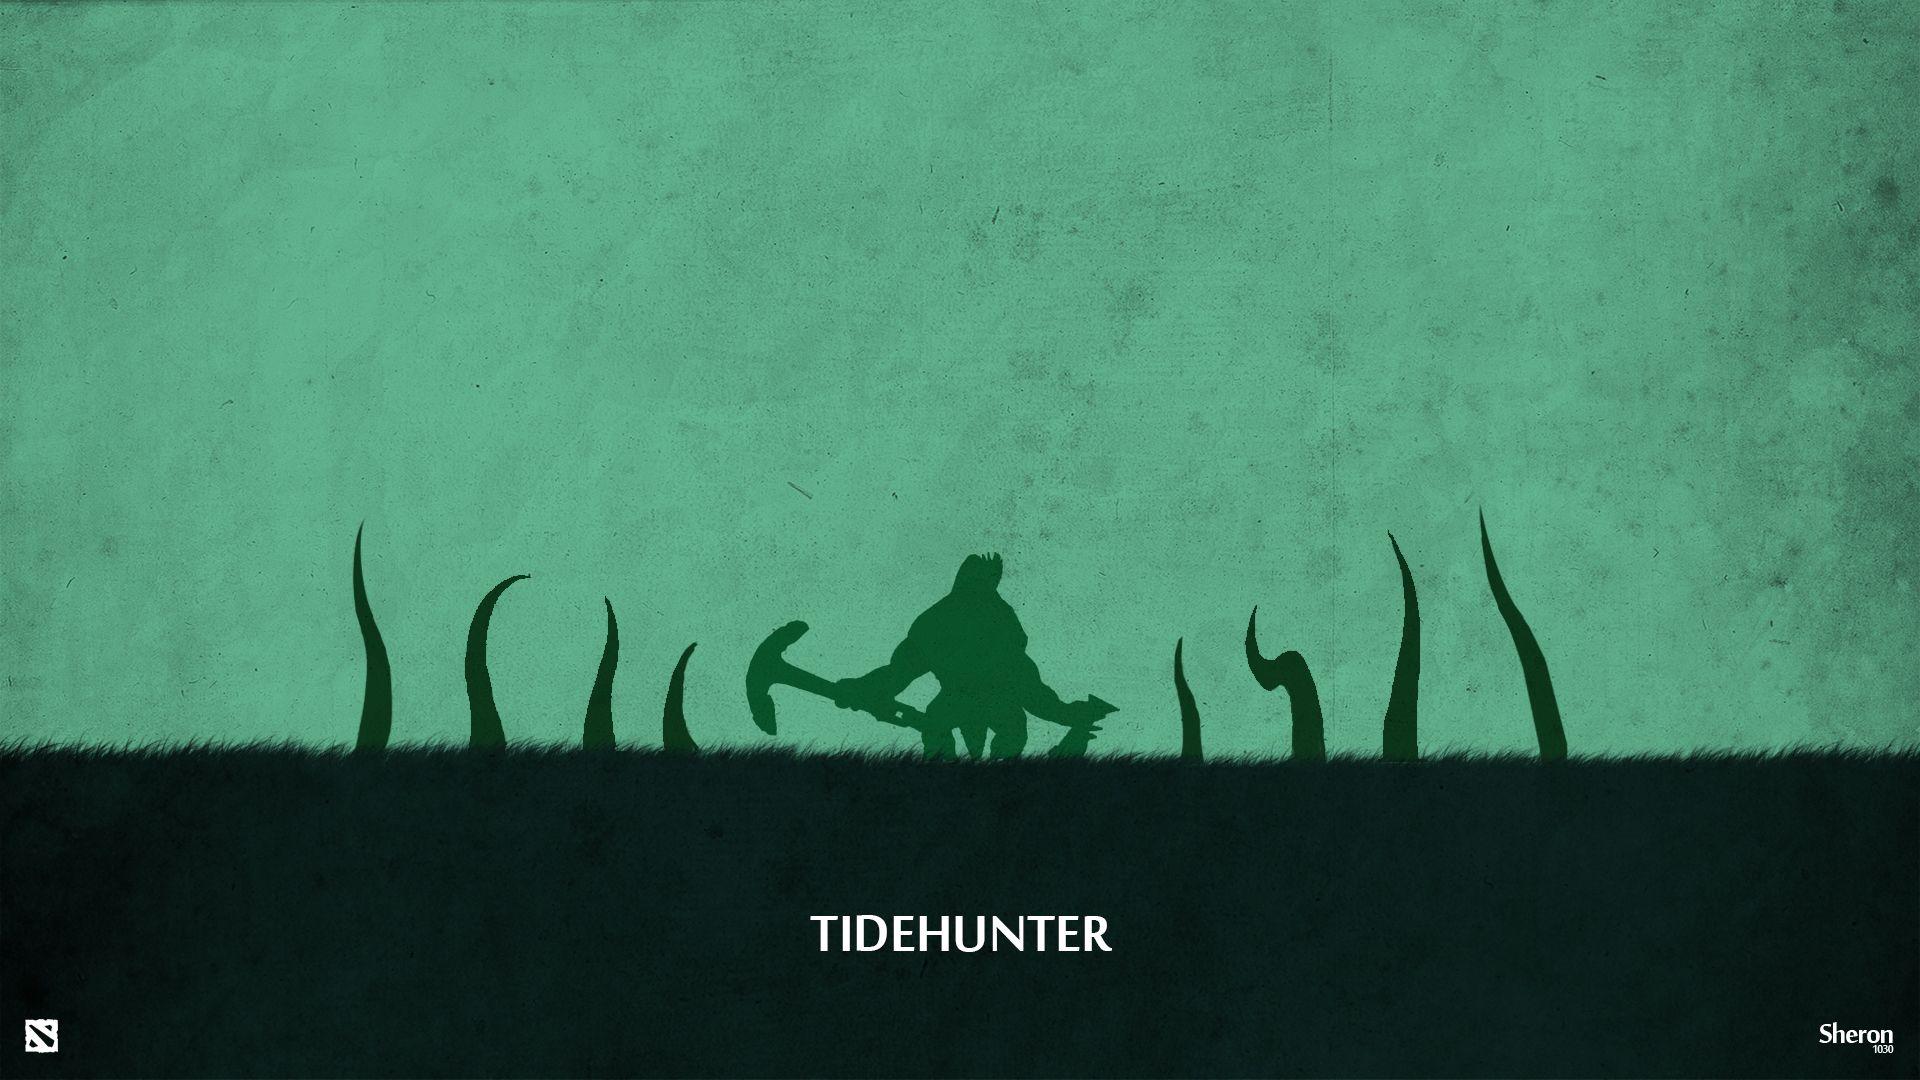 Dota 2   Tidehunter Wallpaper by sheron1030deviantartcom on 1920x1080